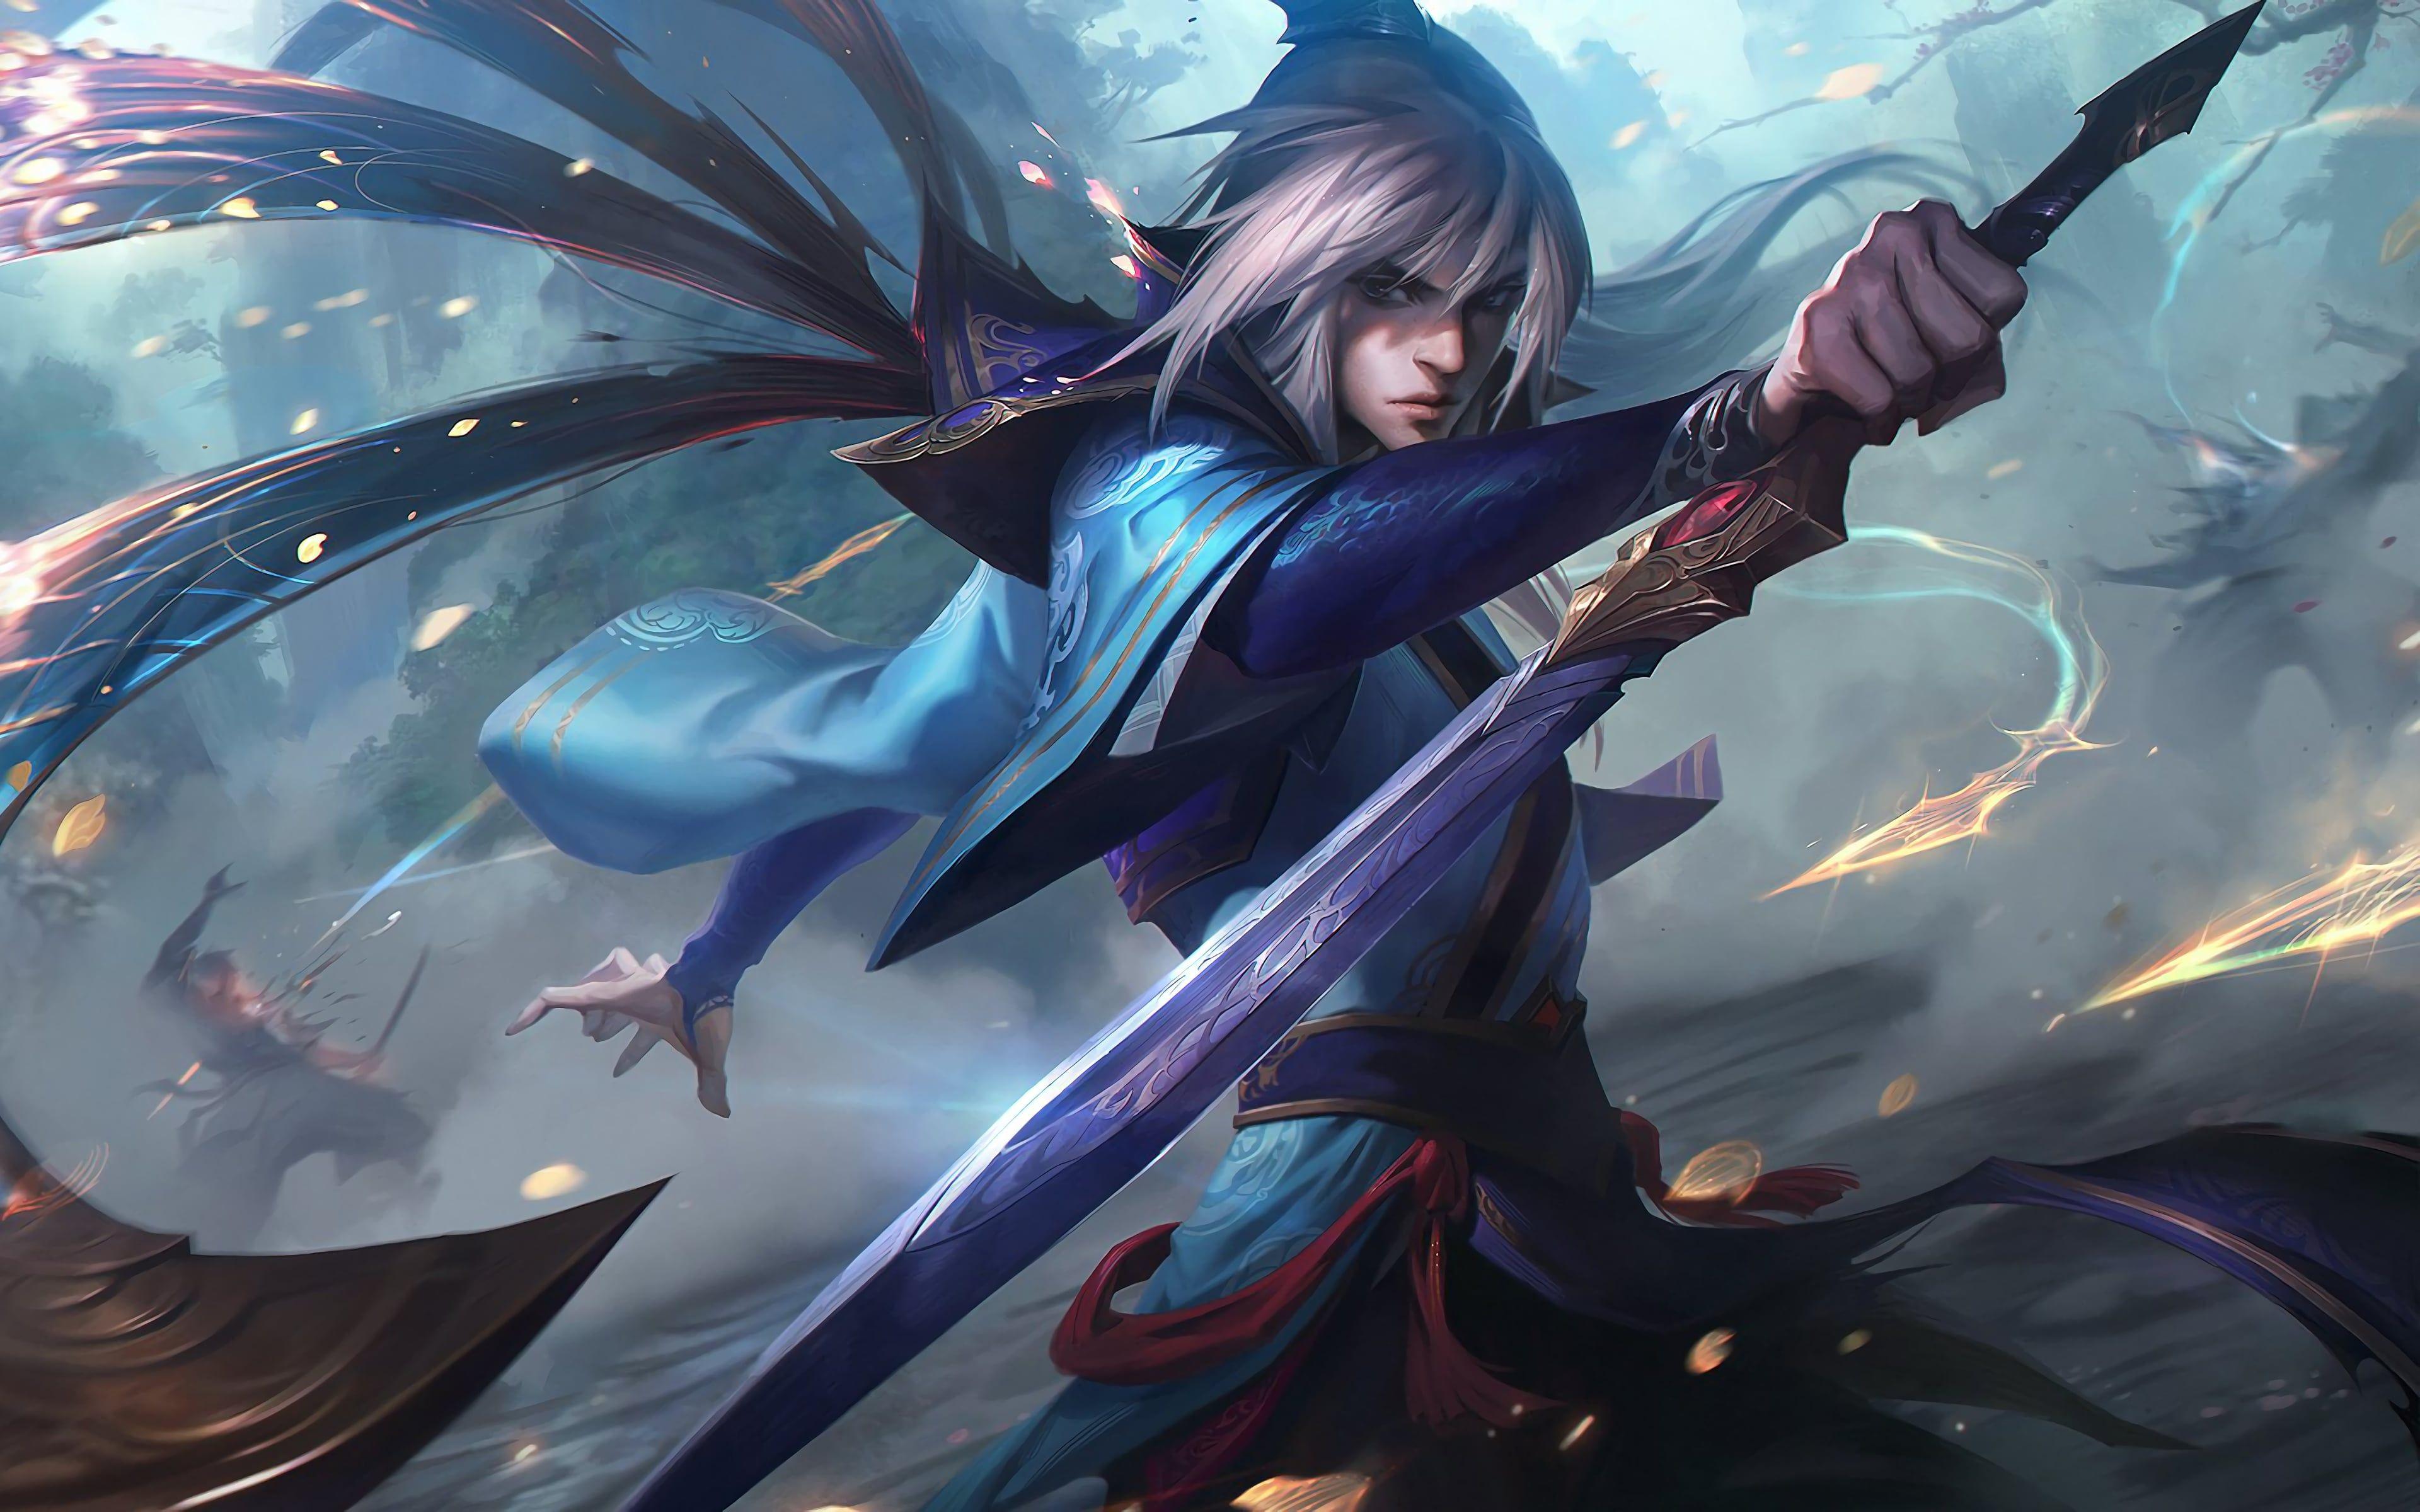 Talon 4k Moba Sword Warrior The best wallpaper